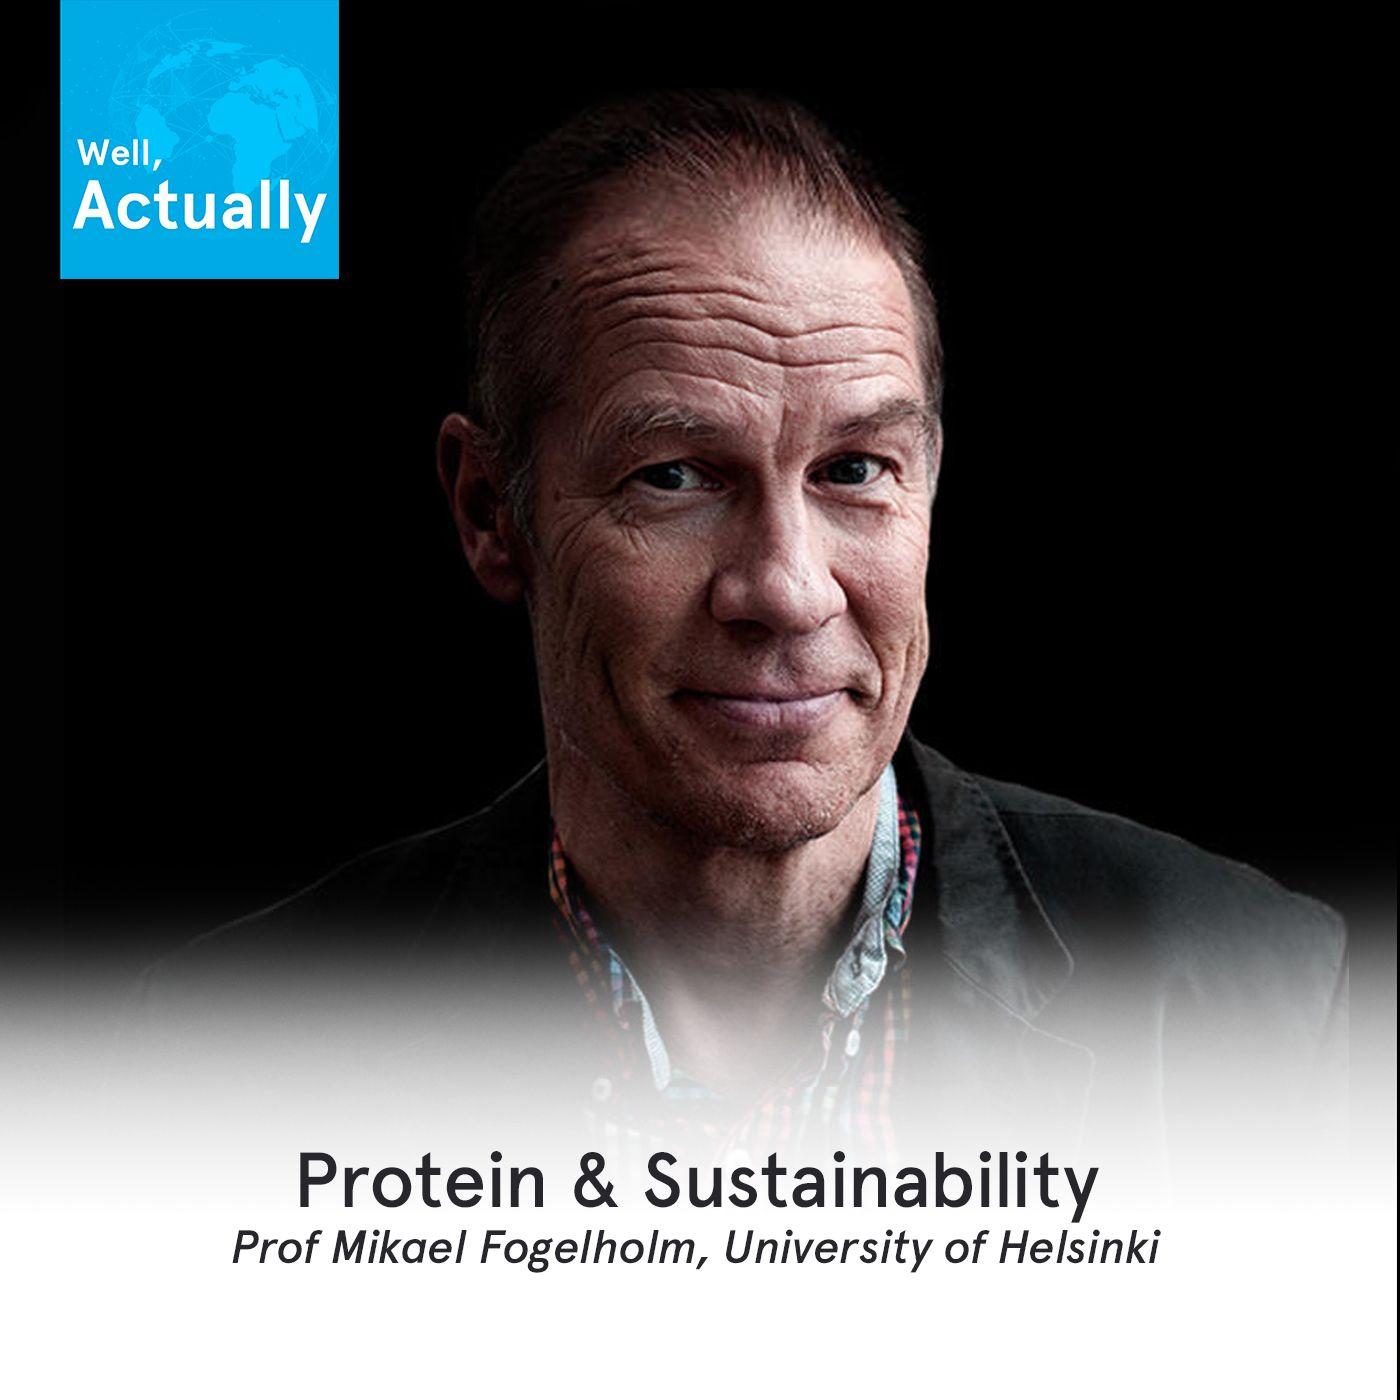 05 - Protein Intake & Sustainability | Prof Mikael Fogelholm